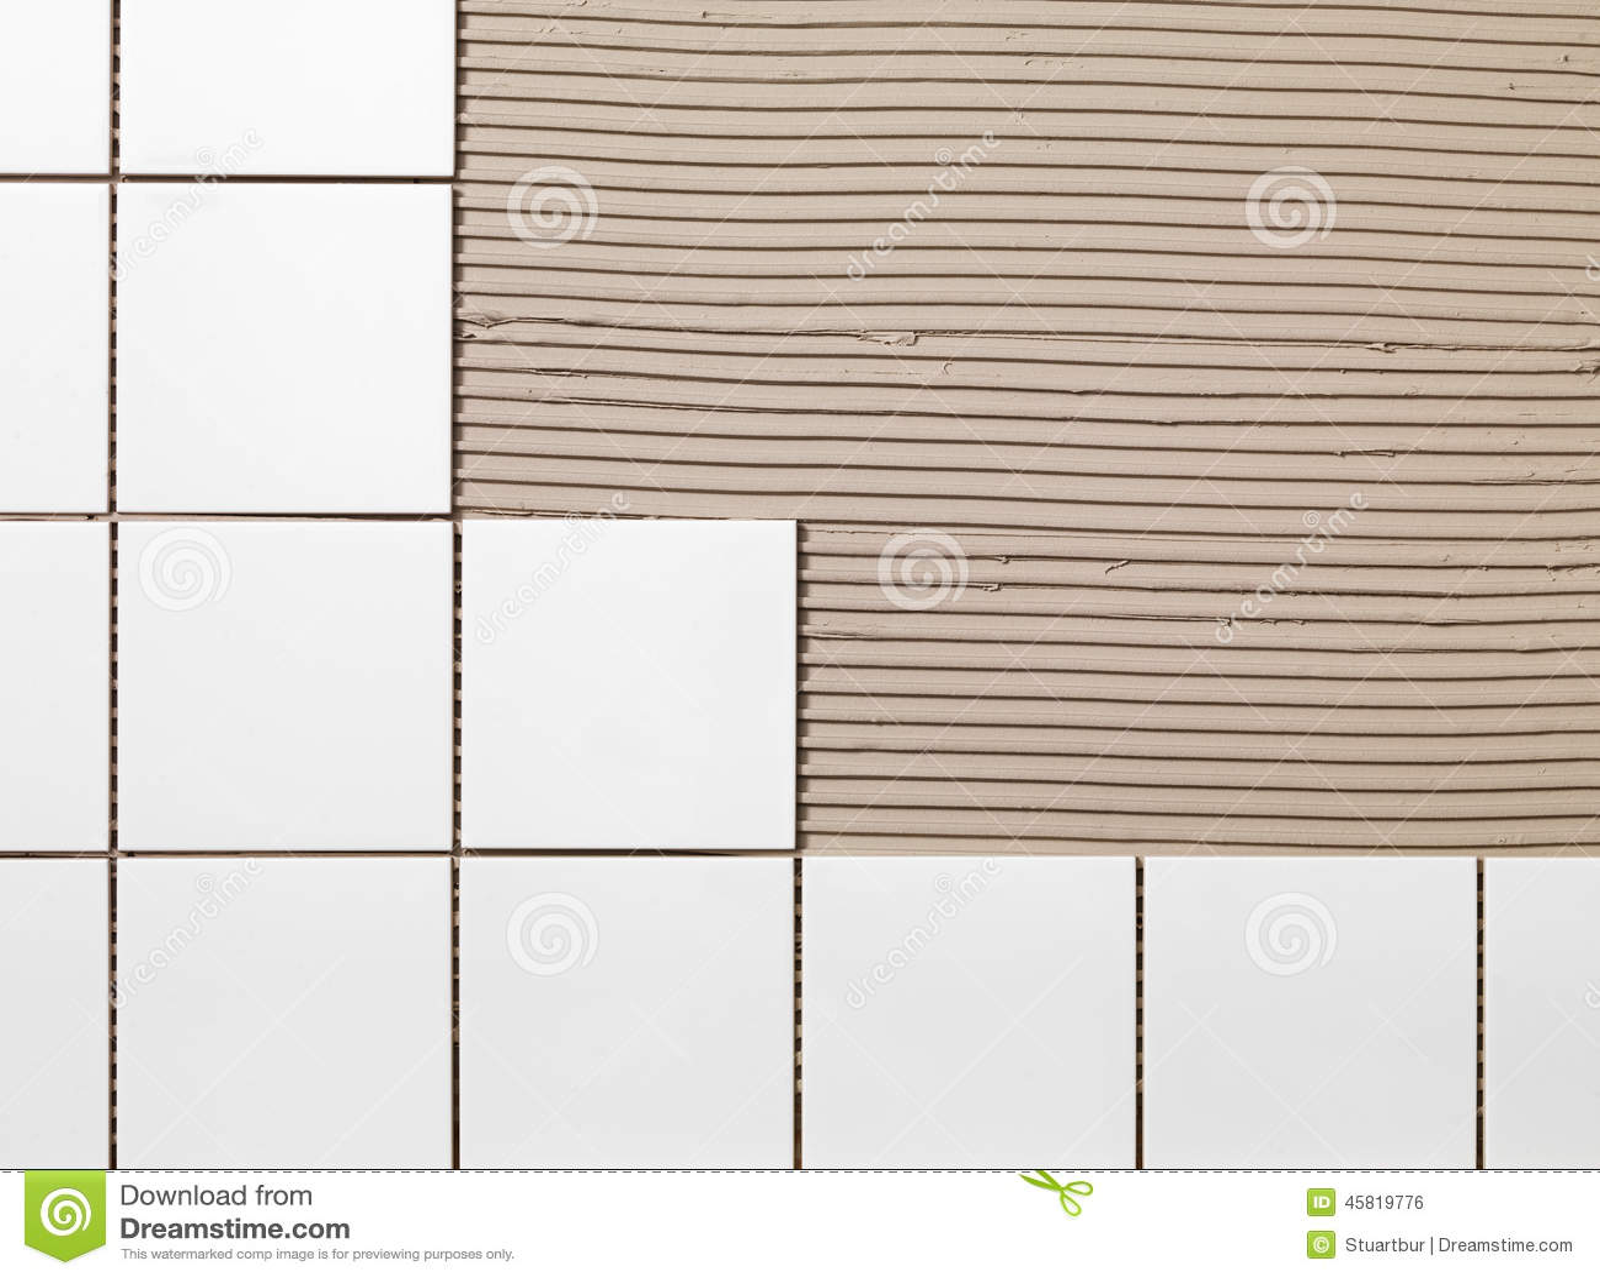 Tile Adhesive stock photo. Image of spatula, white, adhesive - 45819776